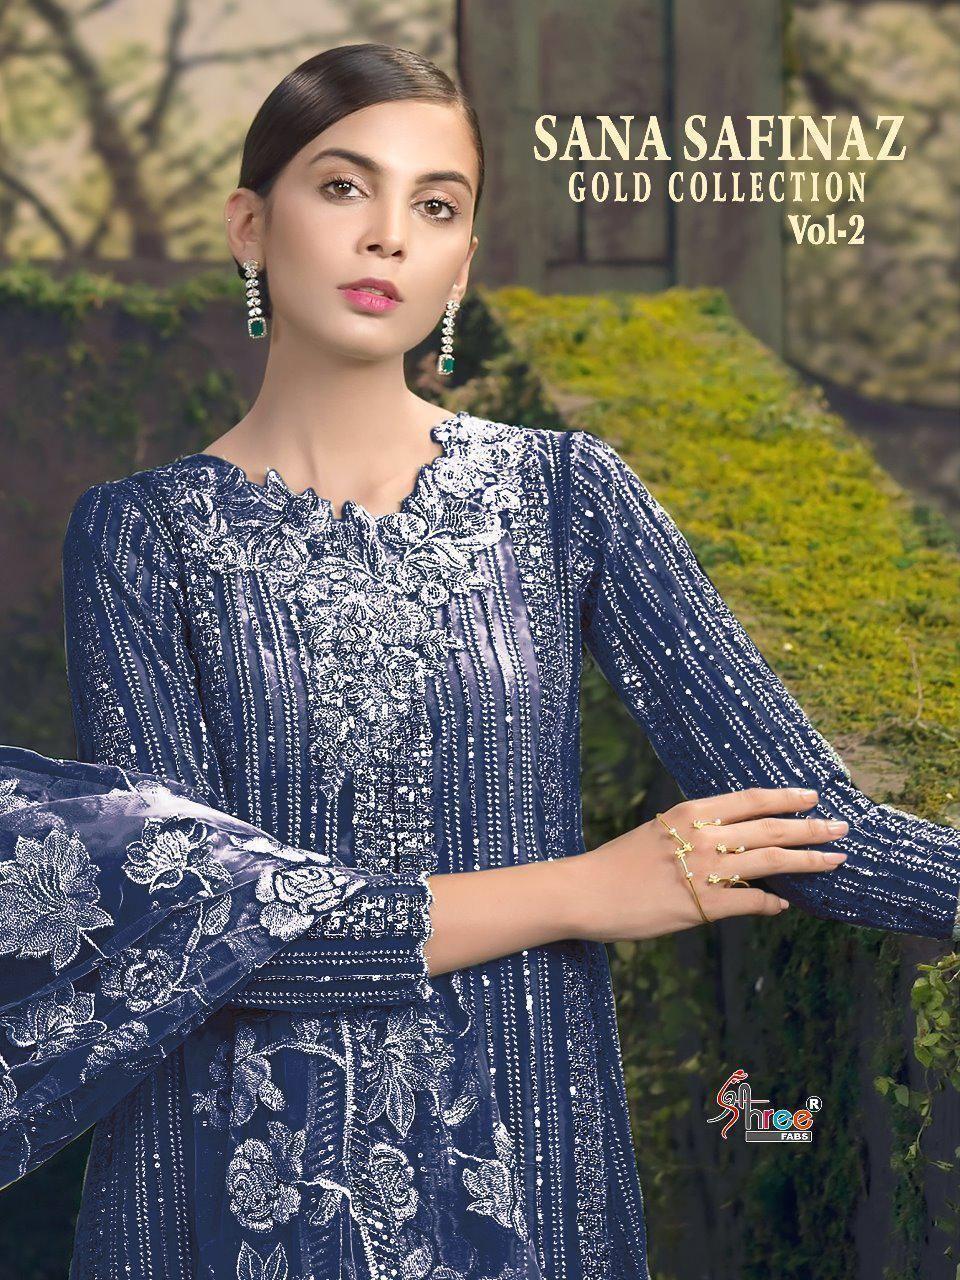 ce27dd1c07 Shree fabs Sana Safinaz gold collection vol 2 Designer Pakistani dress  catalog buy online in surat - KAPDAVILLA